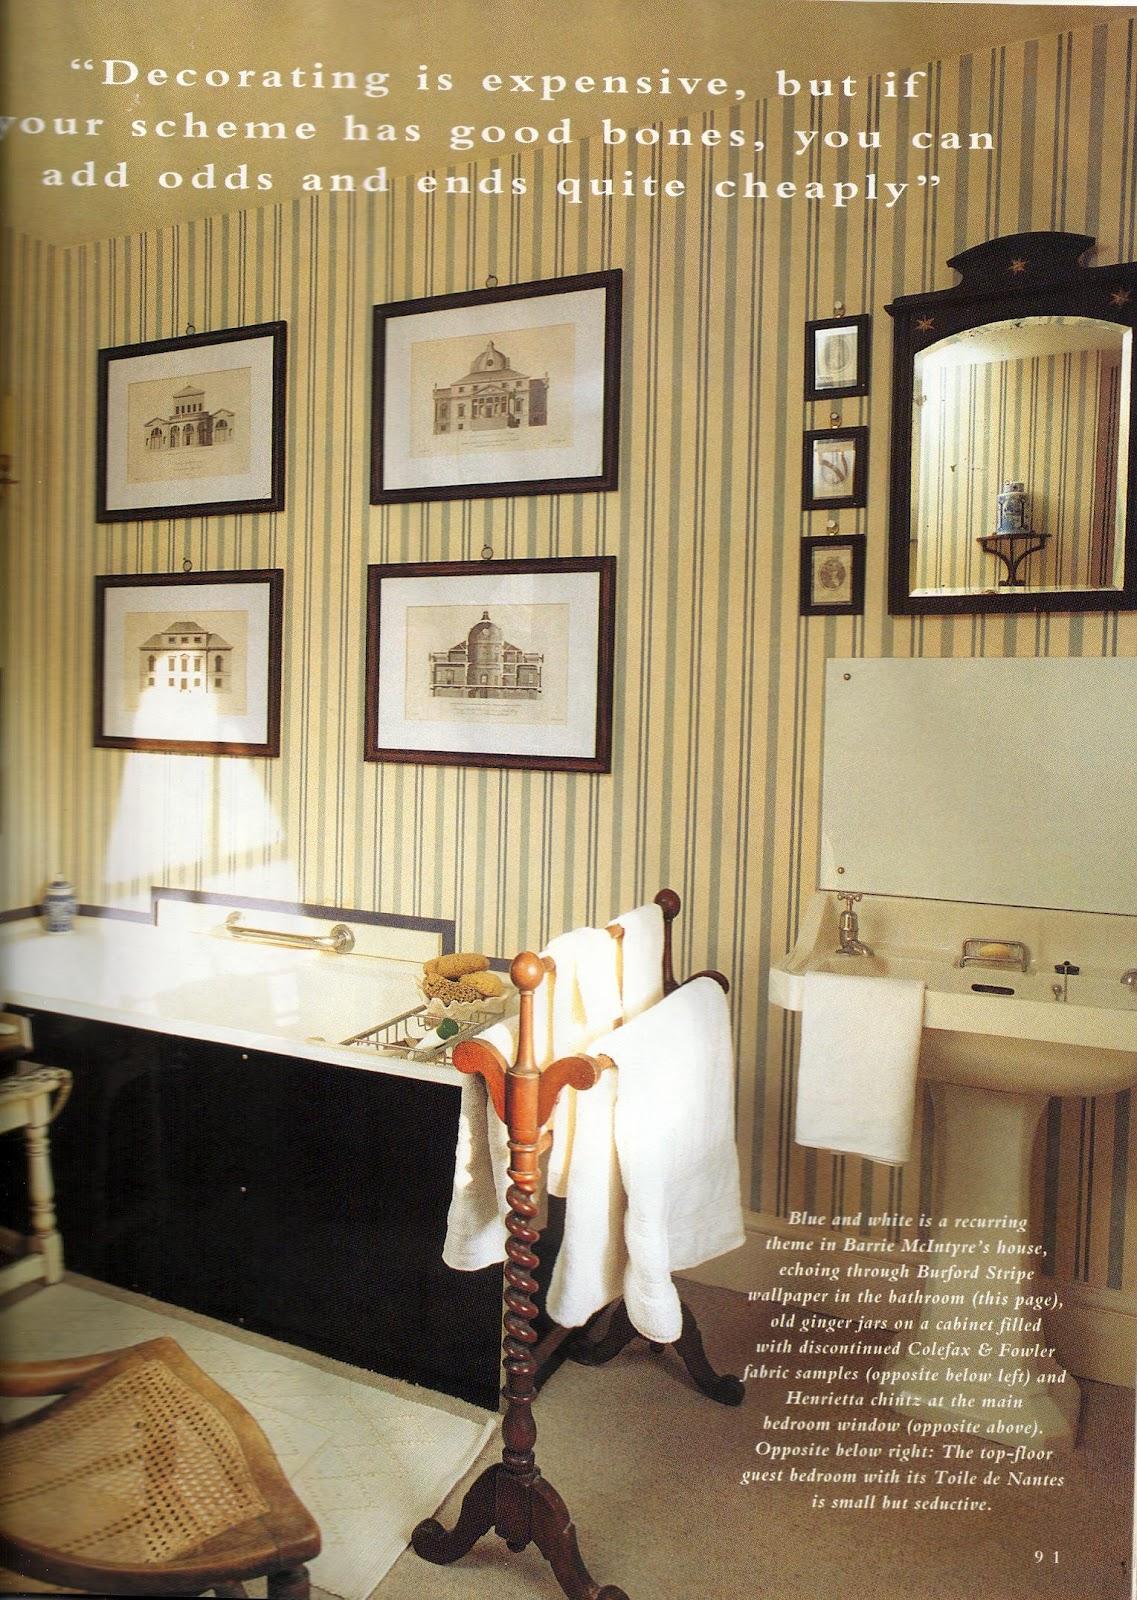 burford stripe wallpaper in bathroom